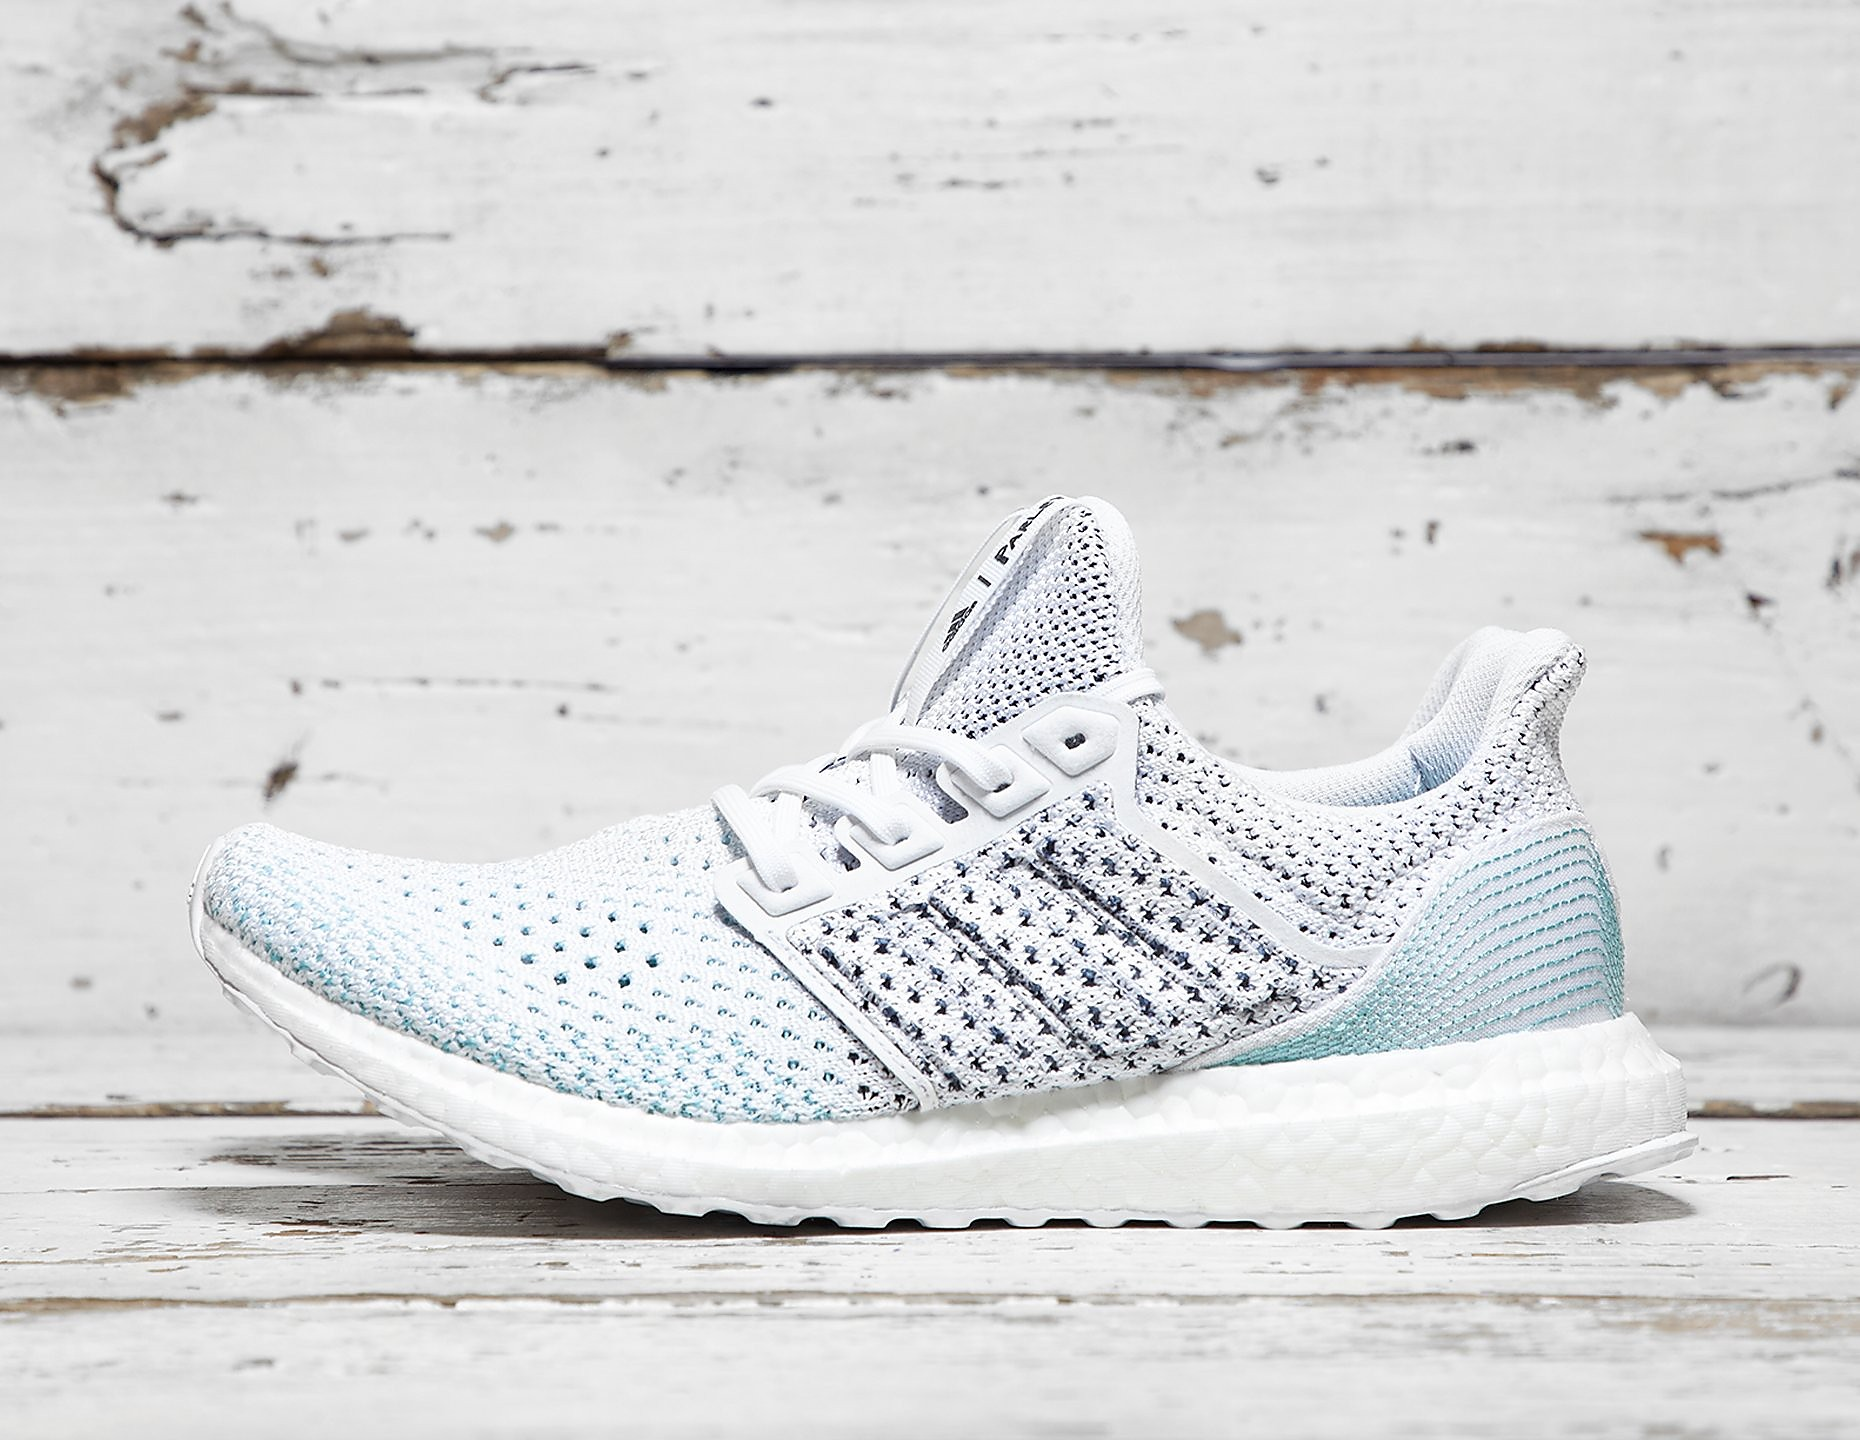 Adidas Boost hombre  Footwear footpatrol ultra